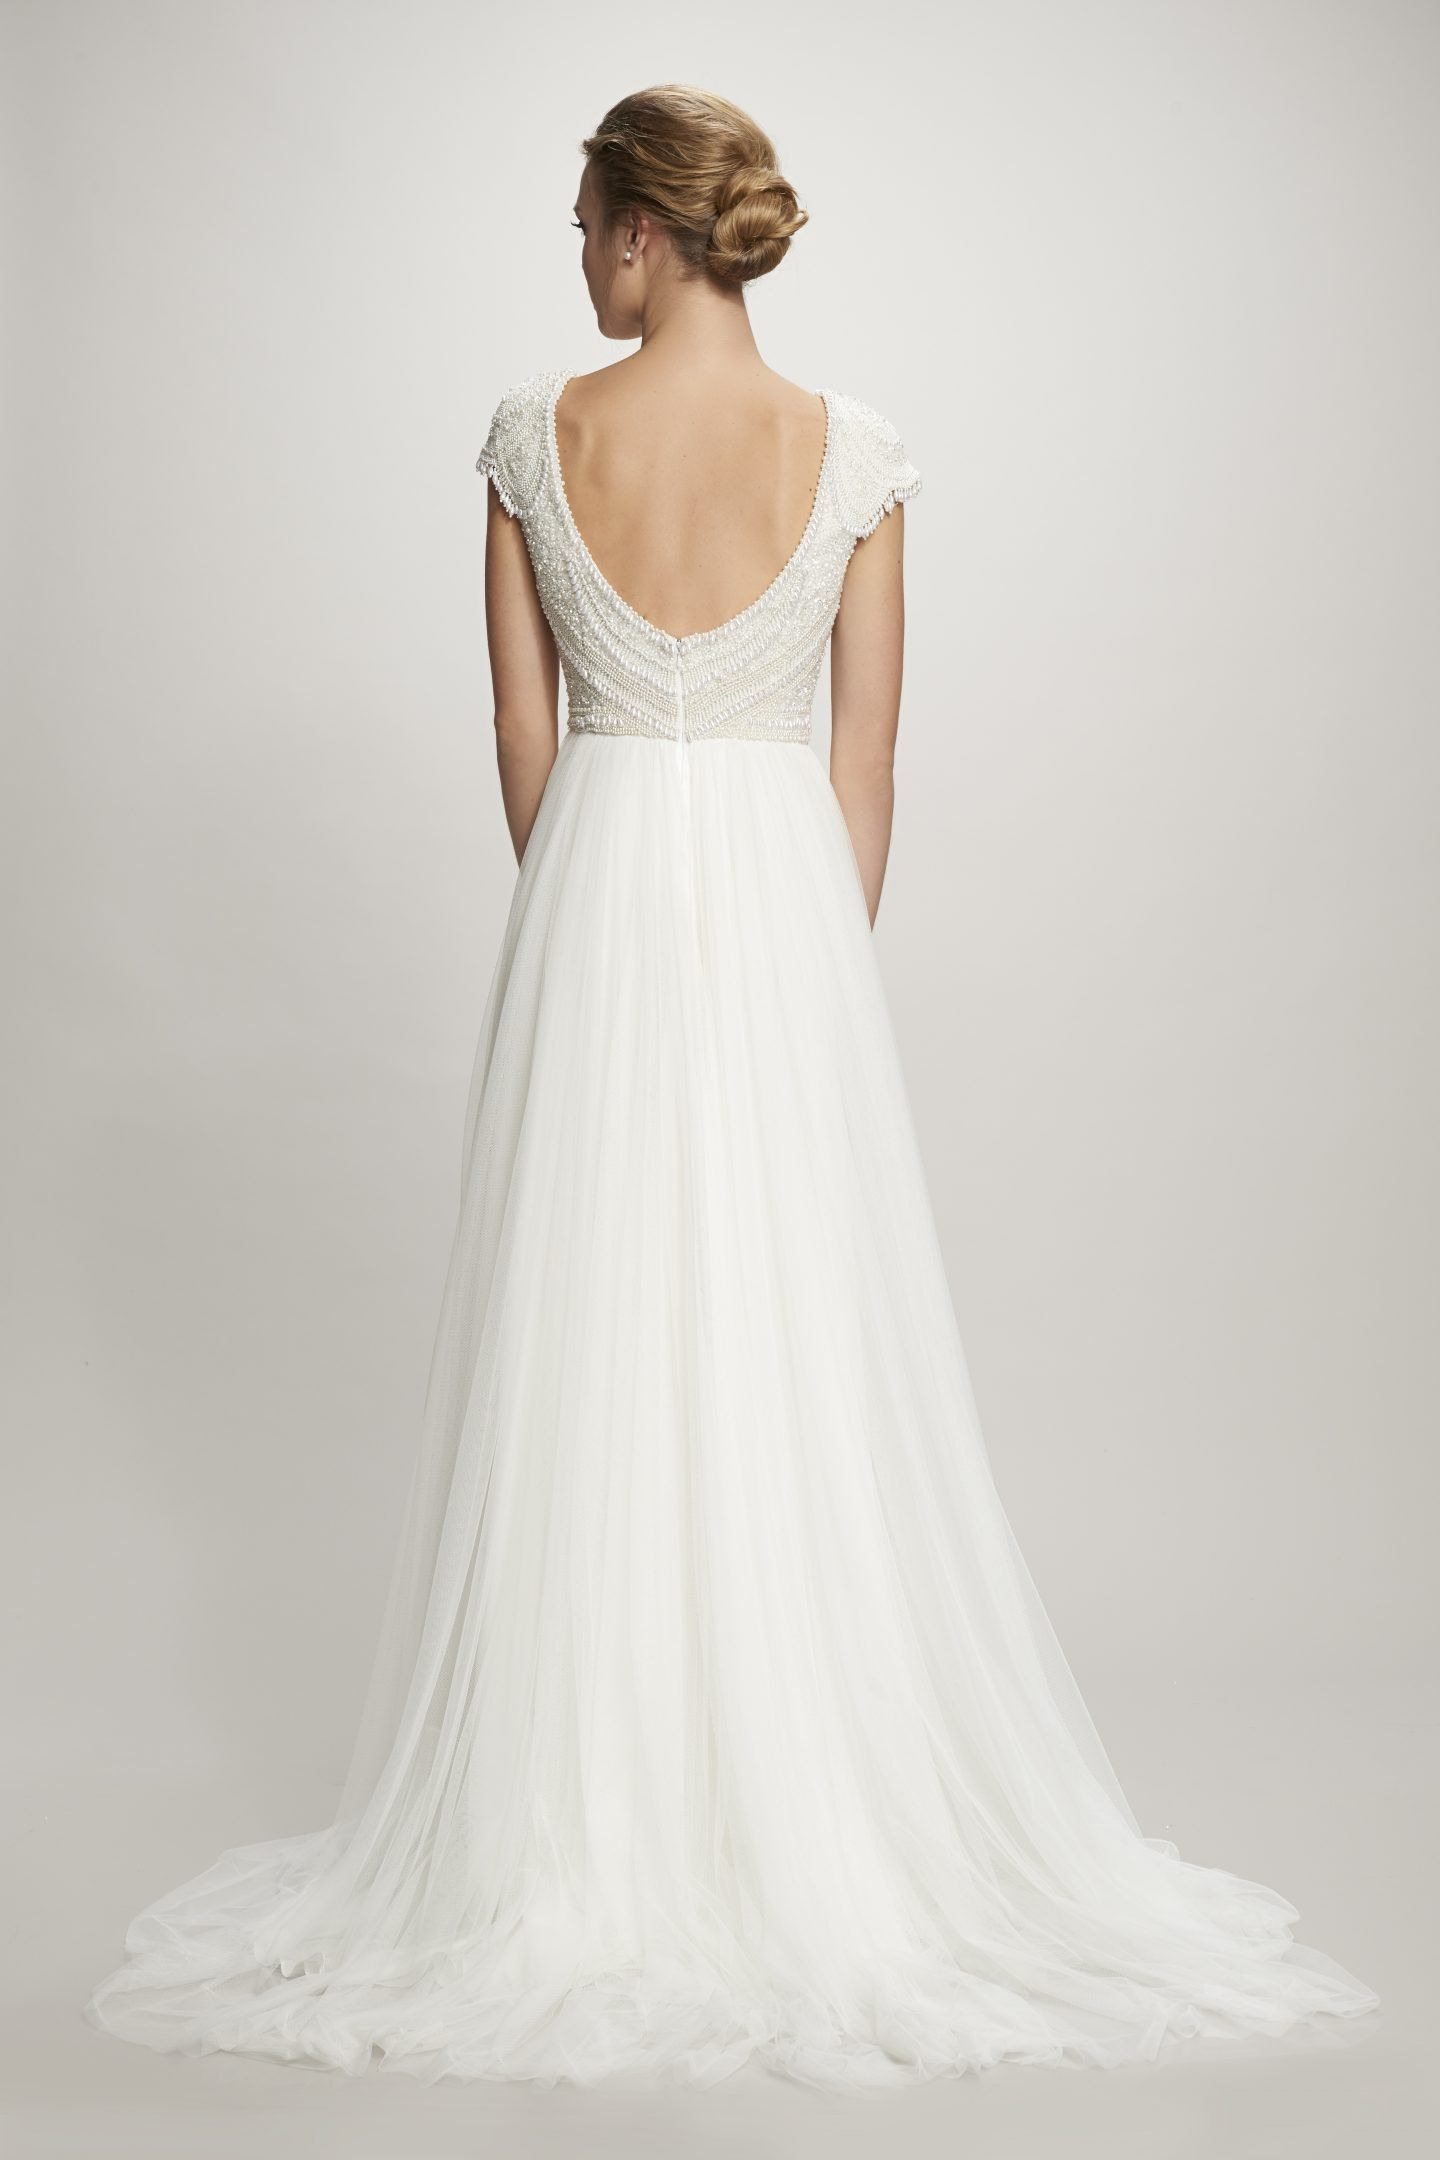 Nima | Kleid Hochzeit, Brautkleid, Brautkleid Vintage